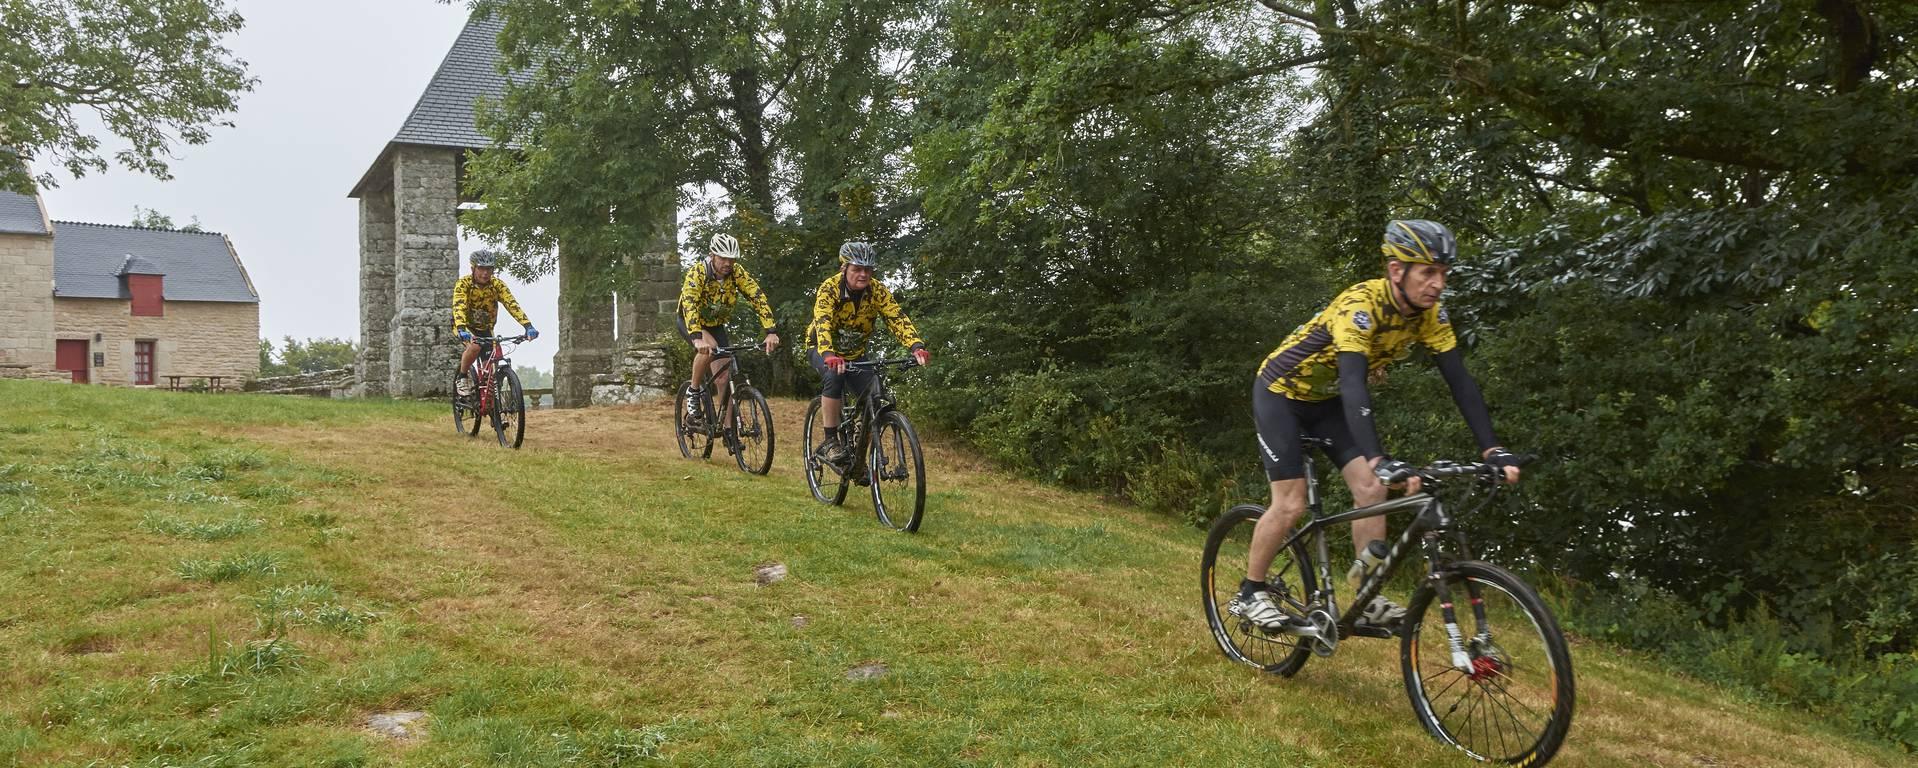 Cycling -© M-A Gouret-Puillandre